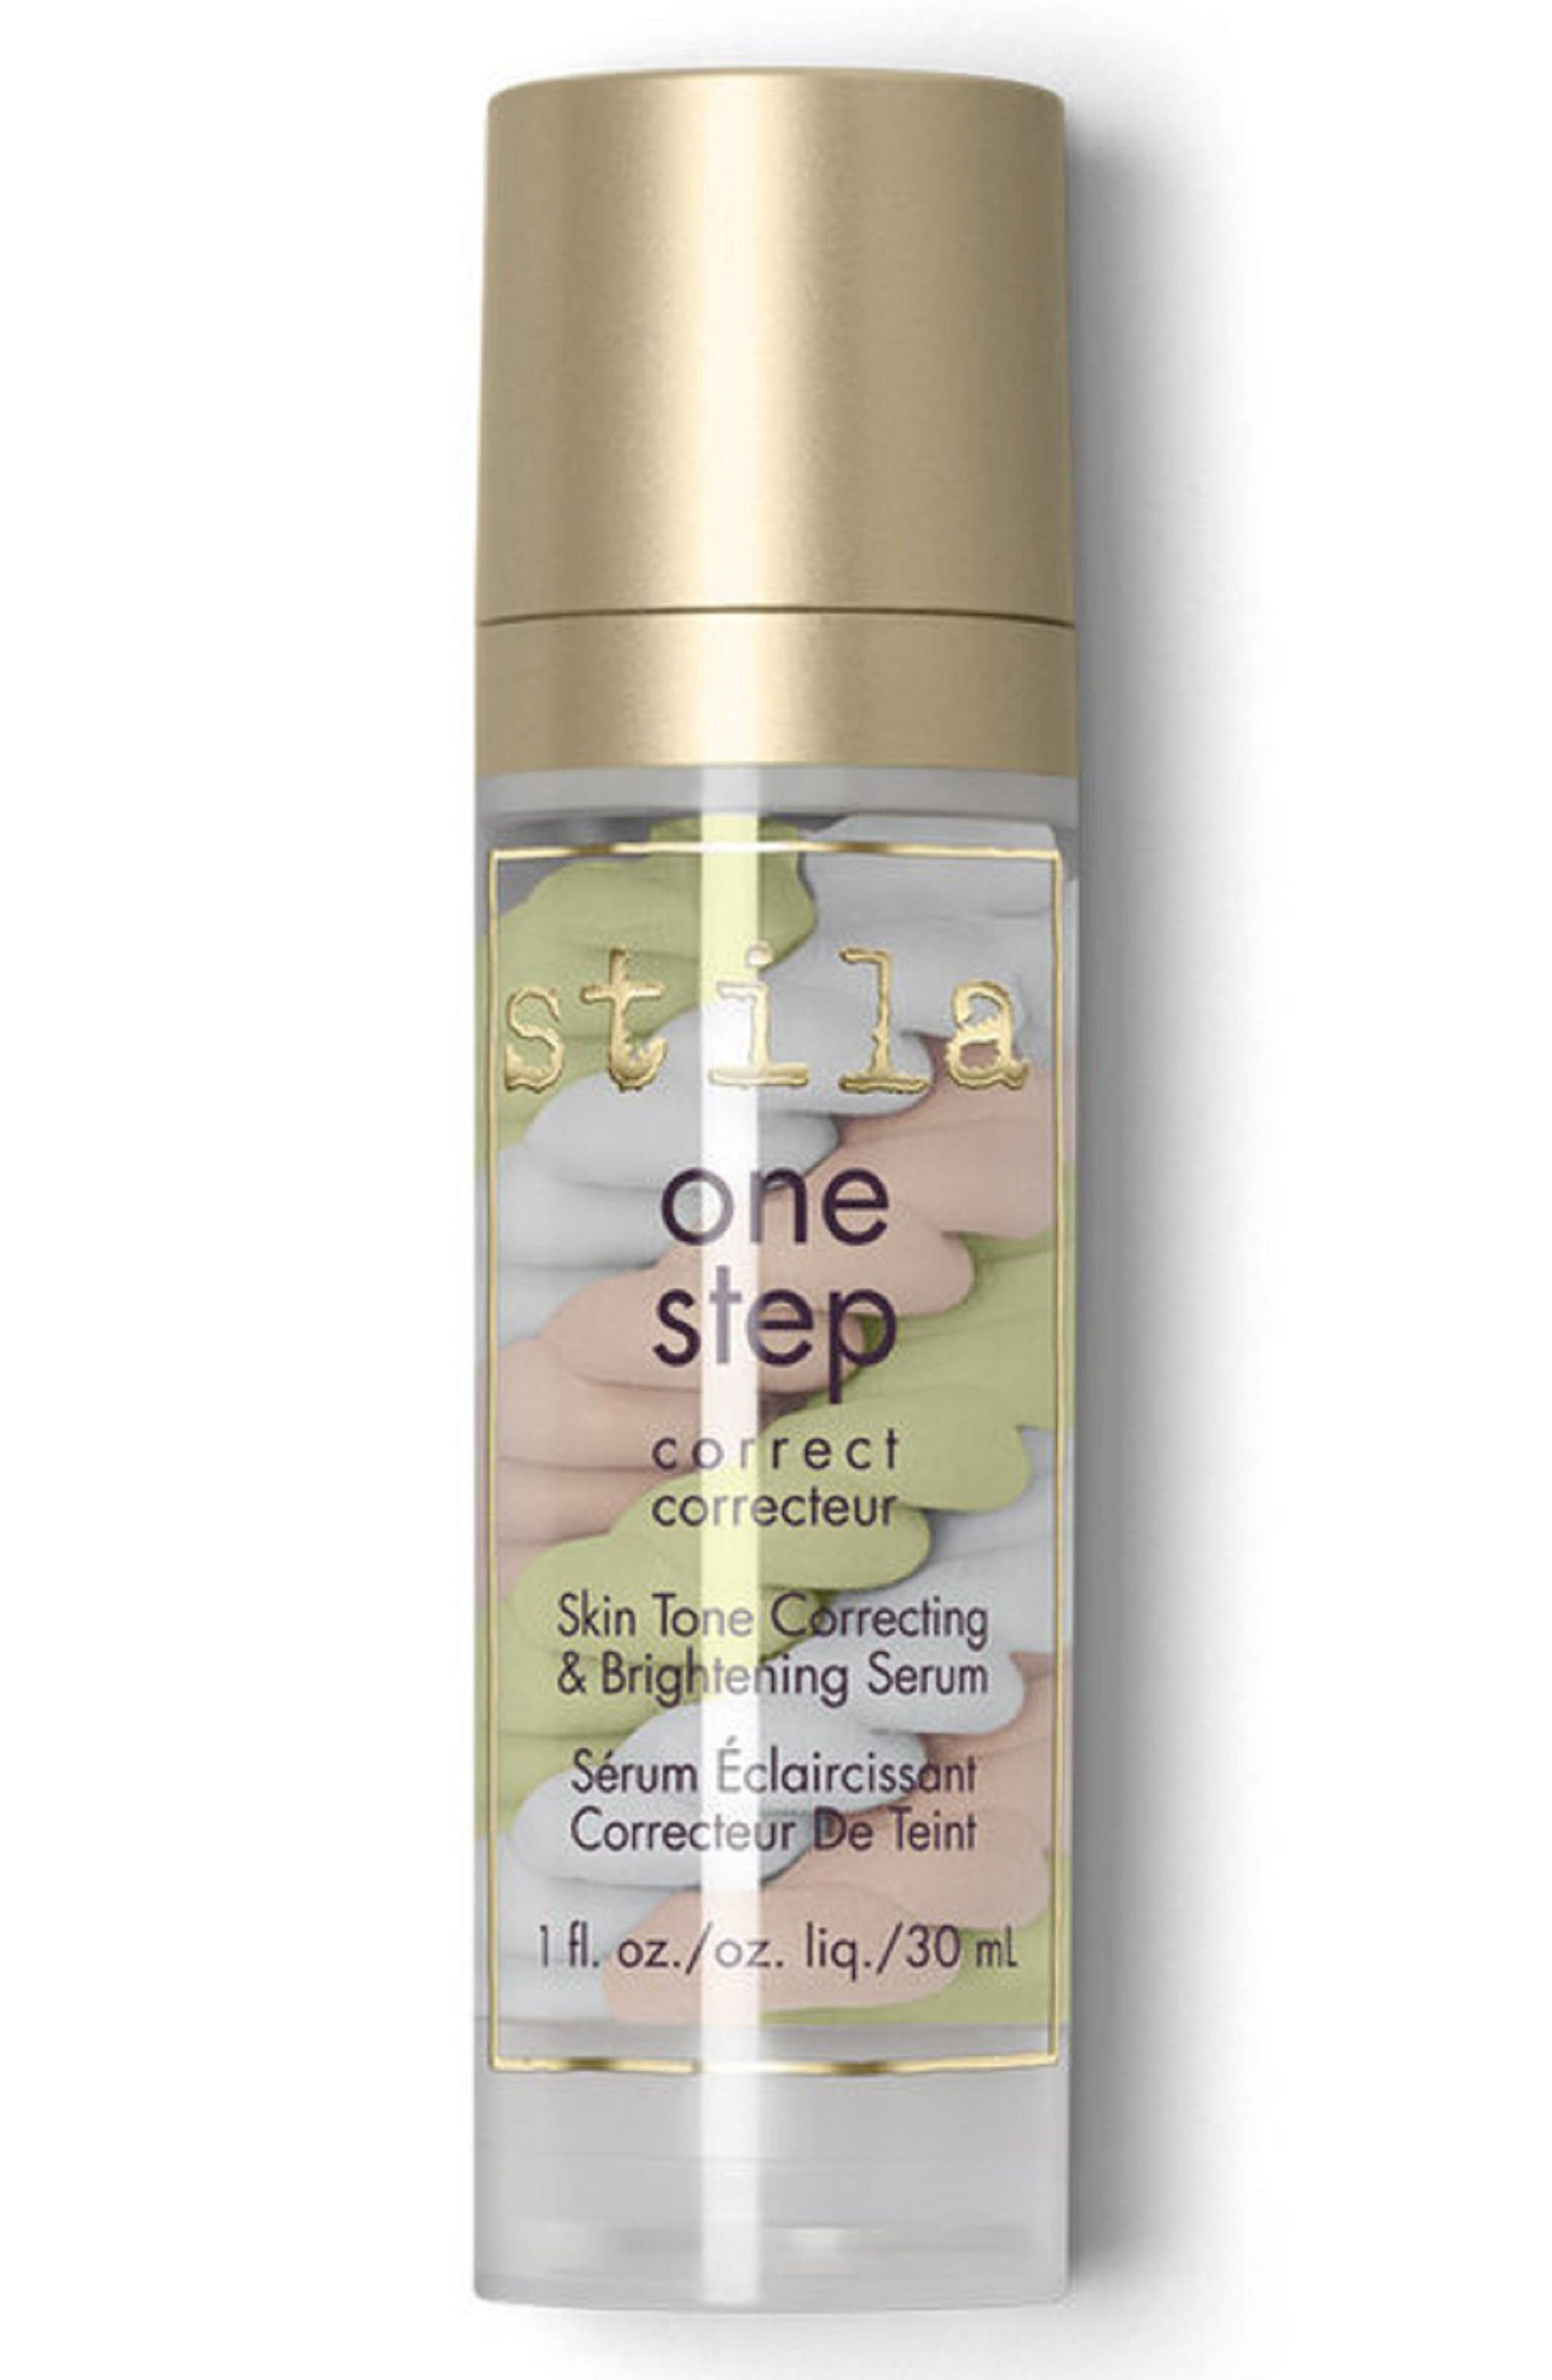 One Step Correct Skin Tone Correcting Brightening Serum,                             Main thumbnail 1, color,                             NO COLOR